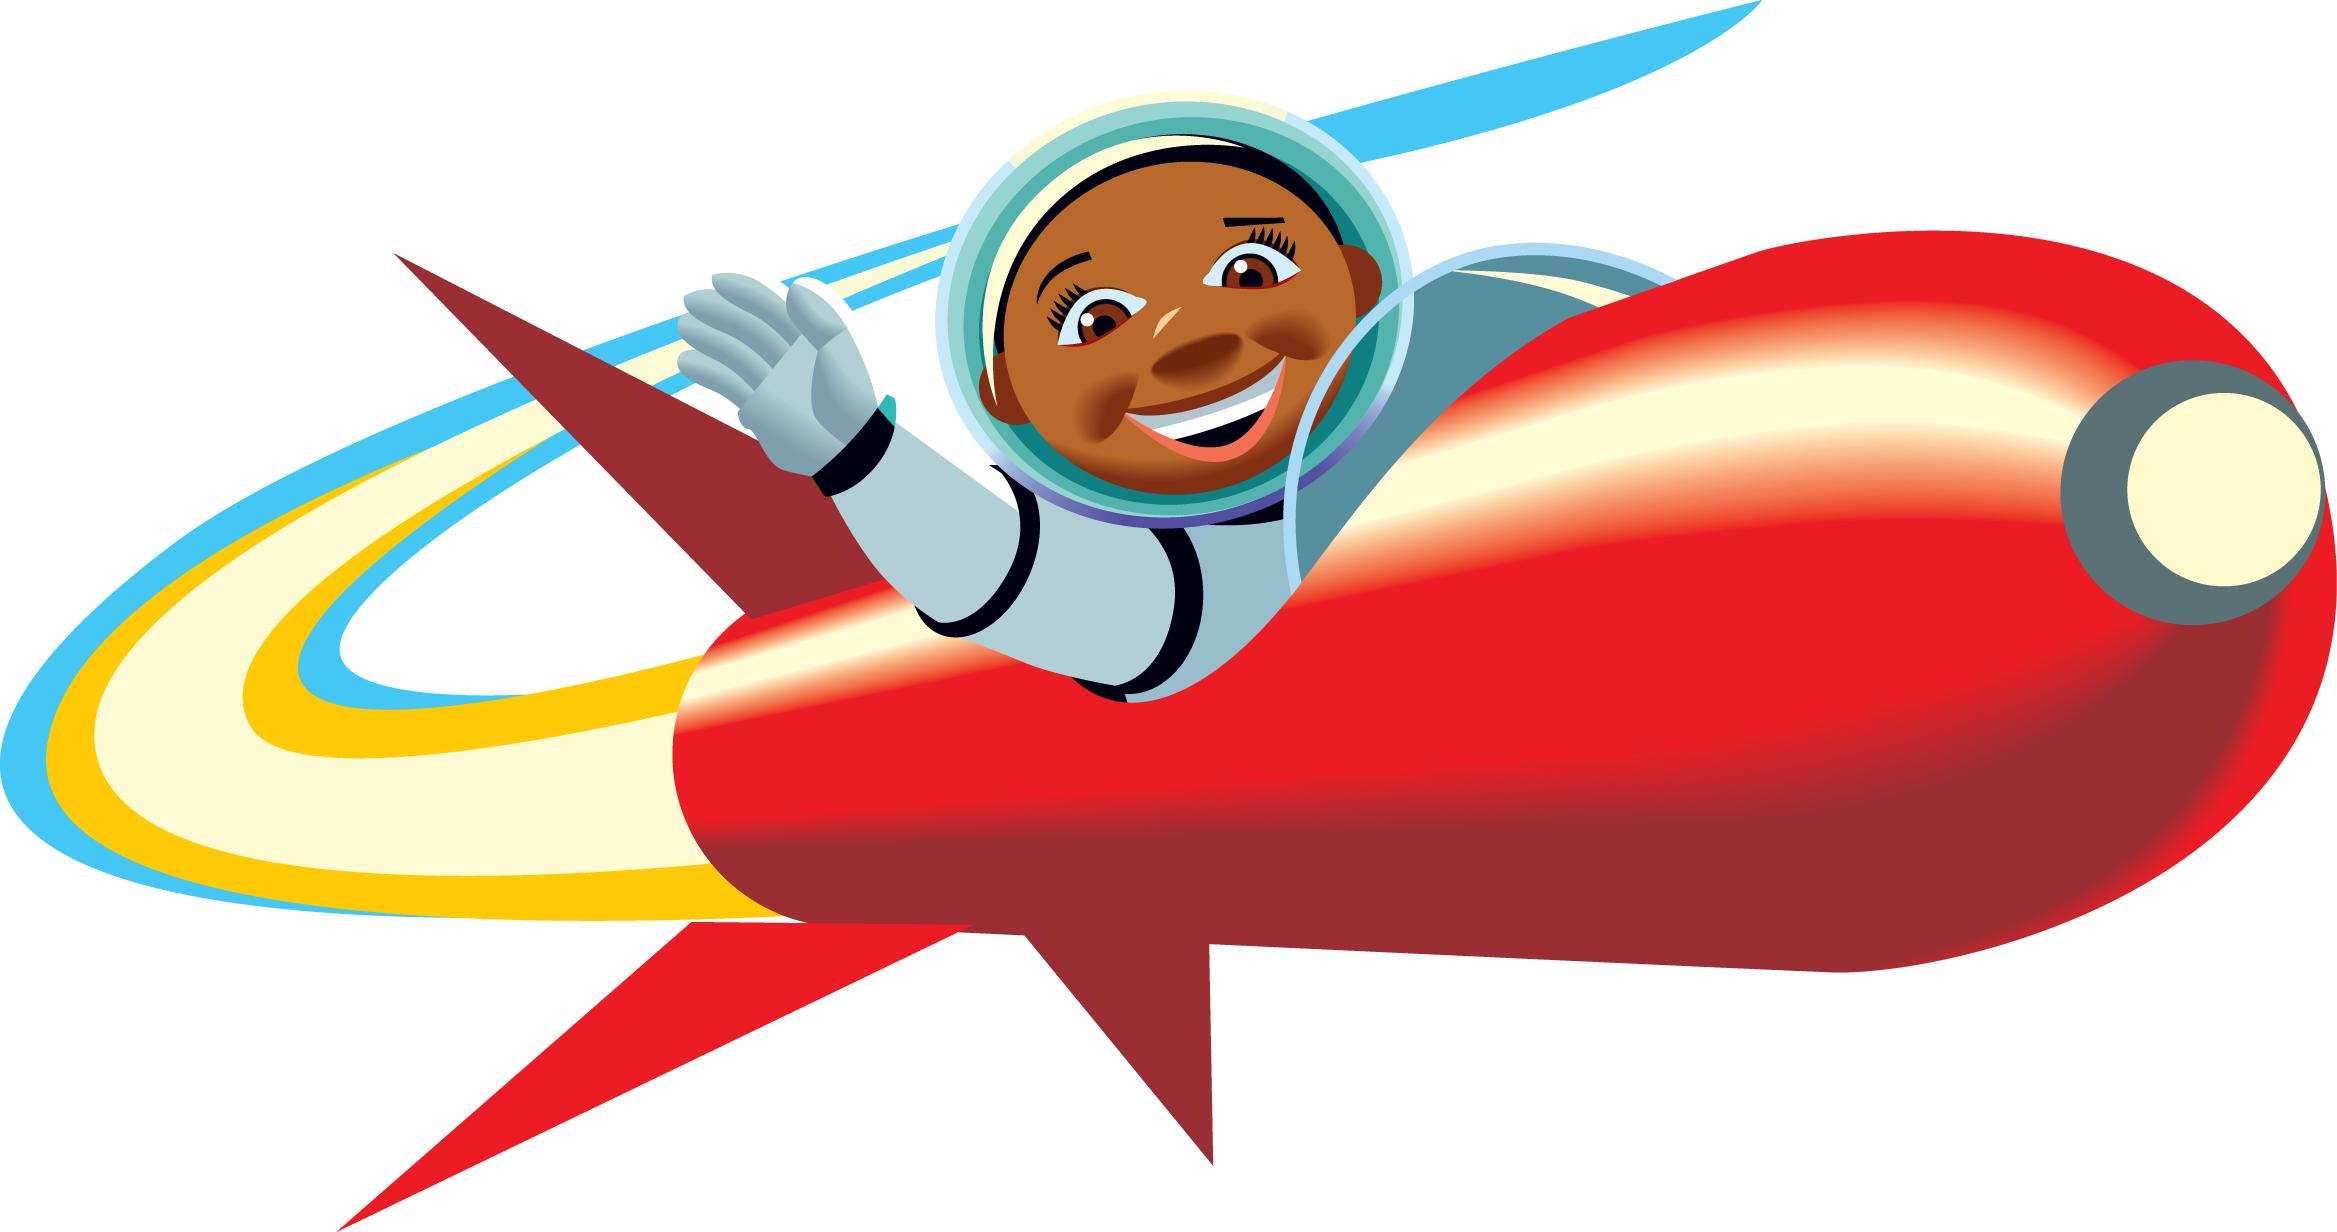 Rocket clip art to download